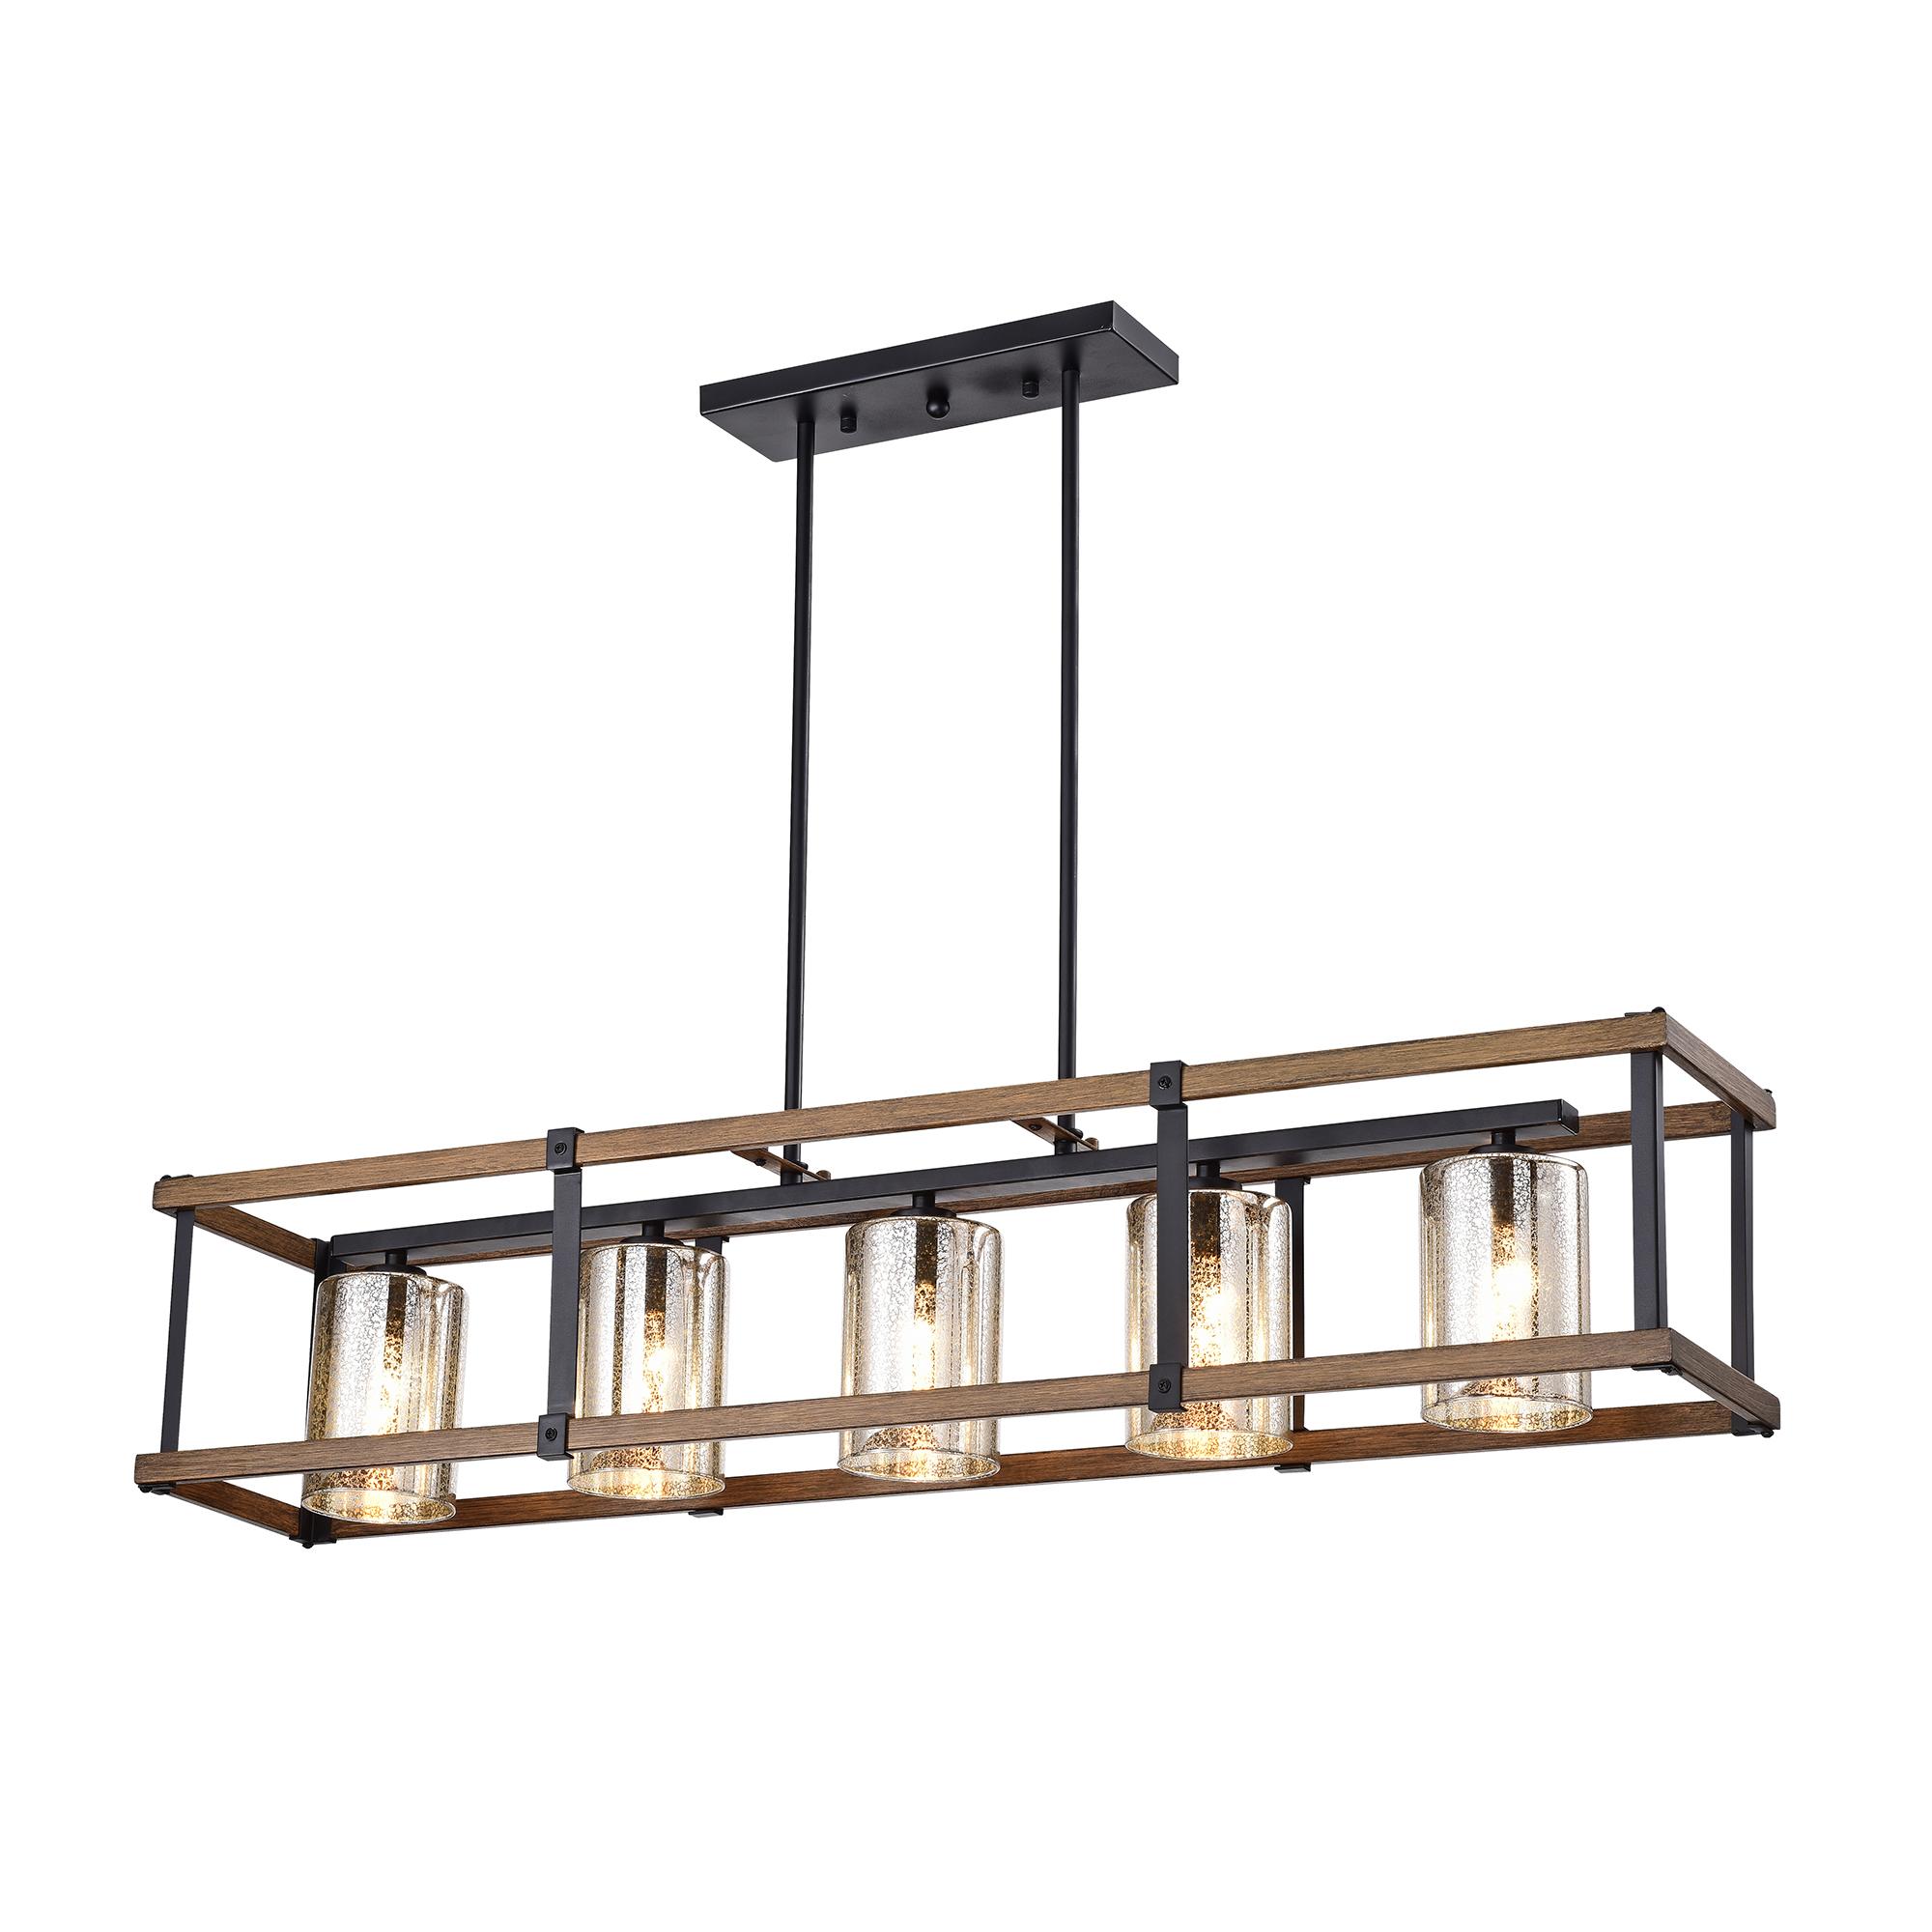 Desaki Faux Wood Grain/Matte Black 5-light Chandelier